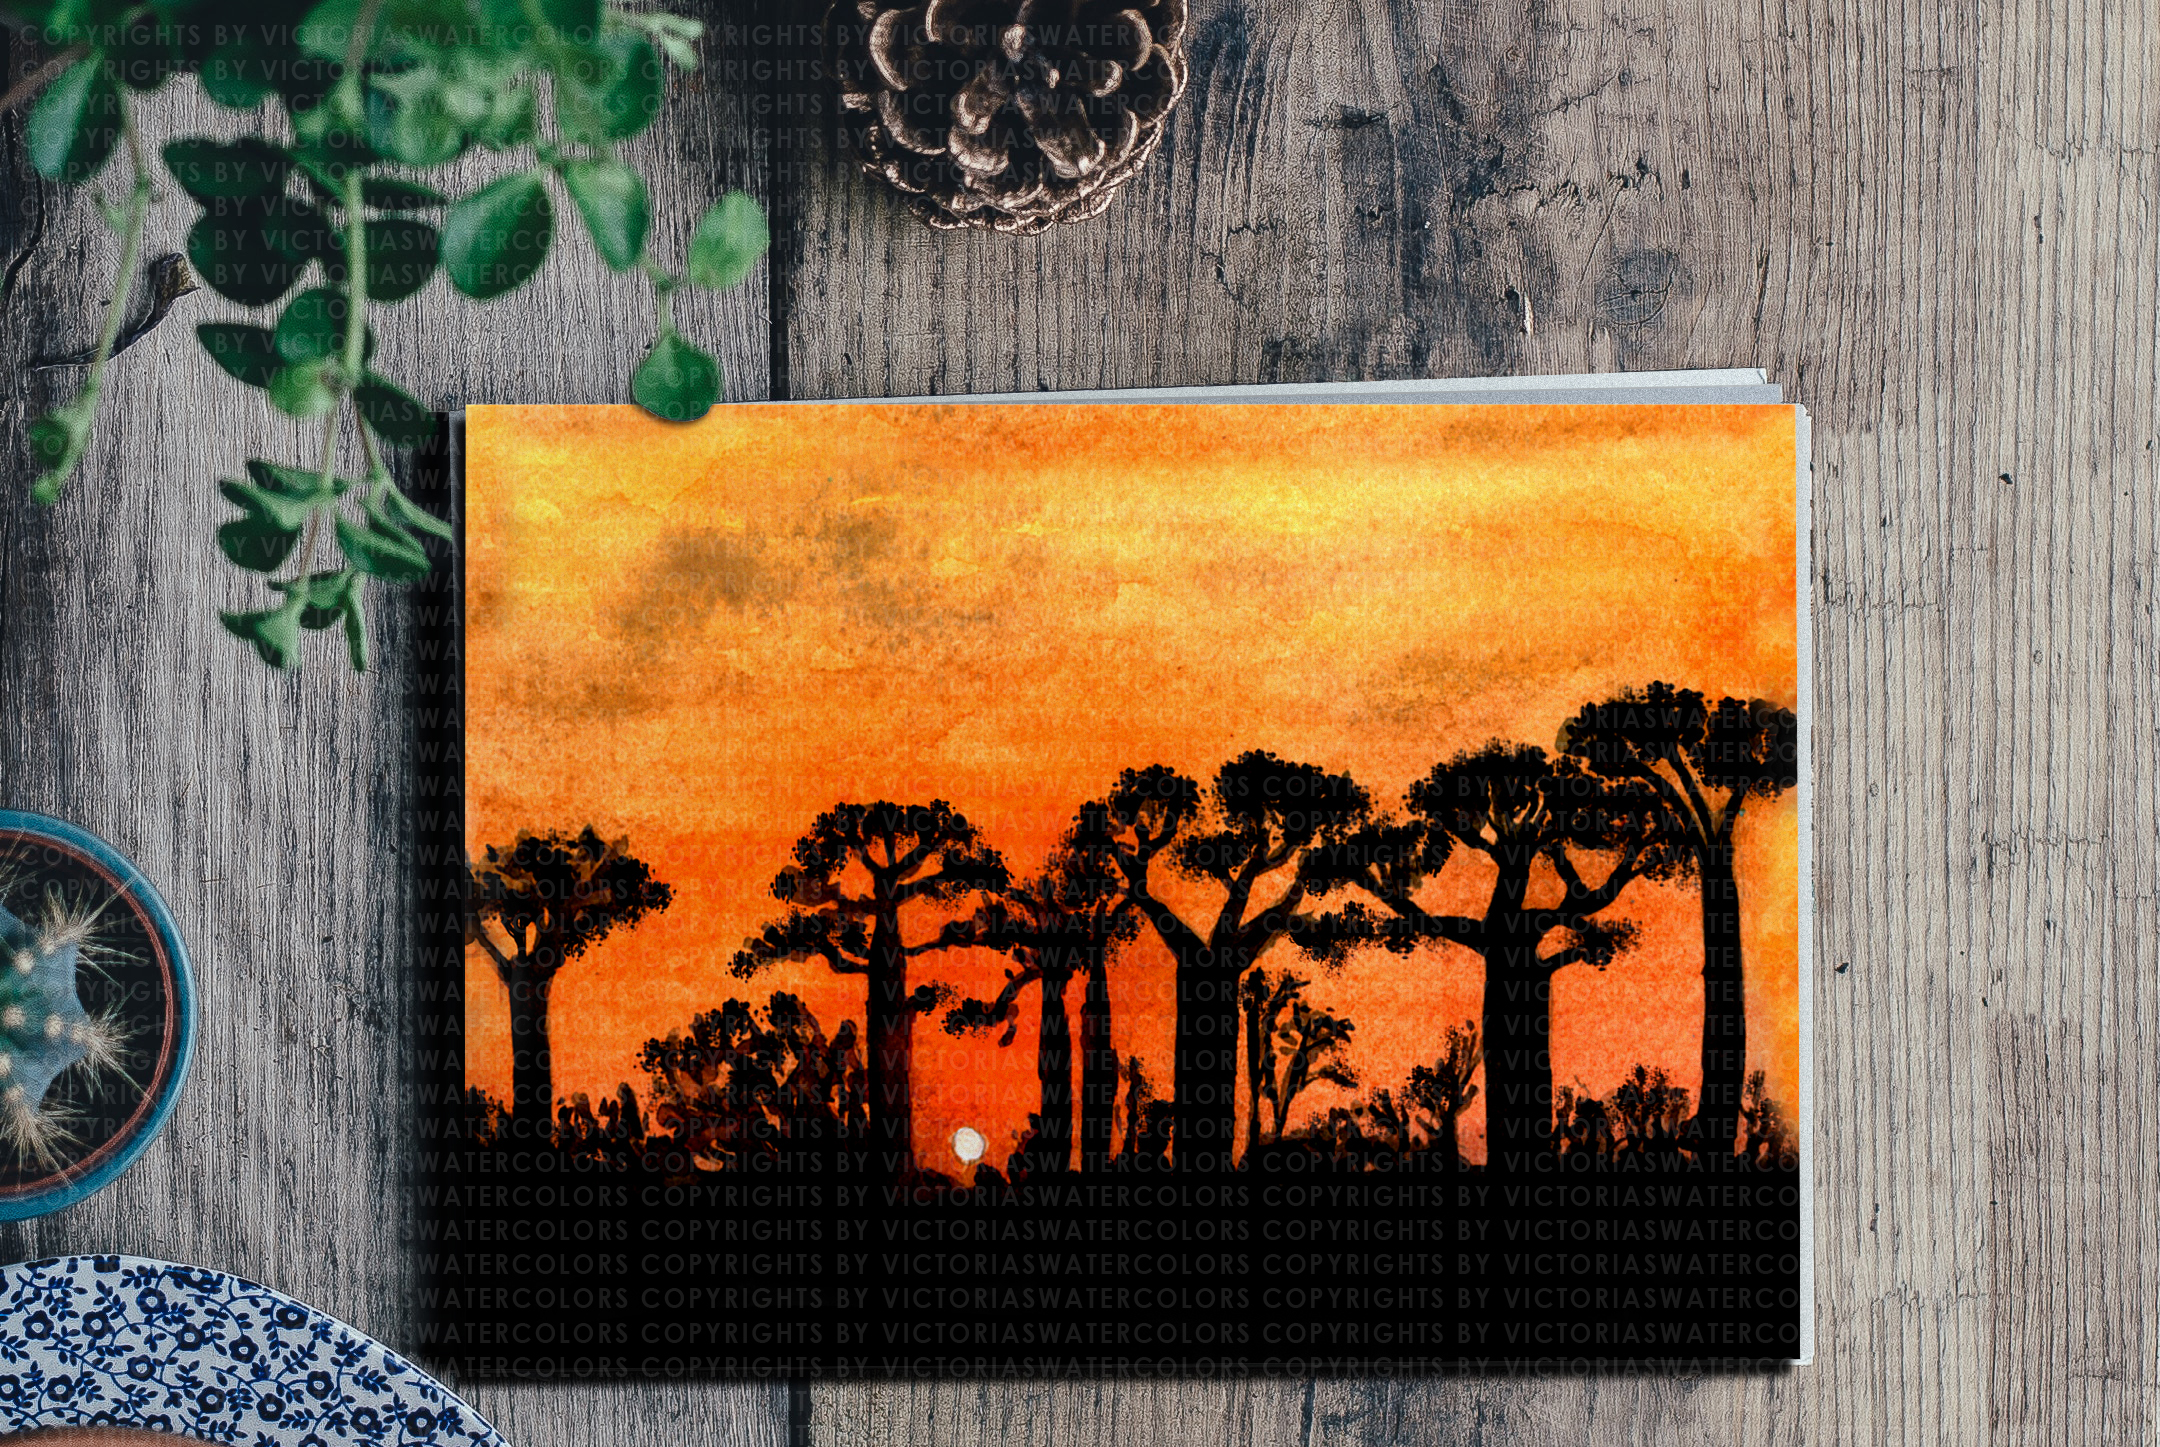 Watercolor Landscape Bundle Watercolor Beach Sunset Galaxy Texture Watercolor Farm Windmill example image 2